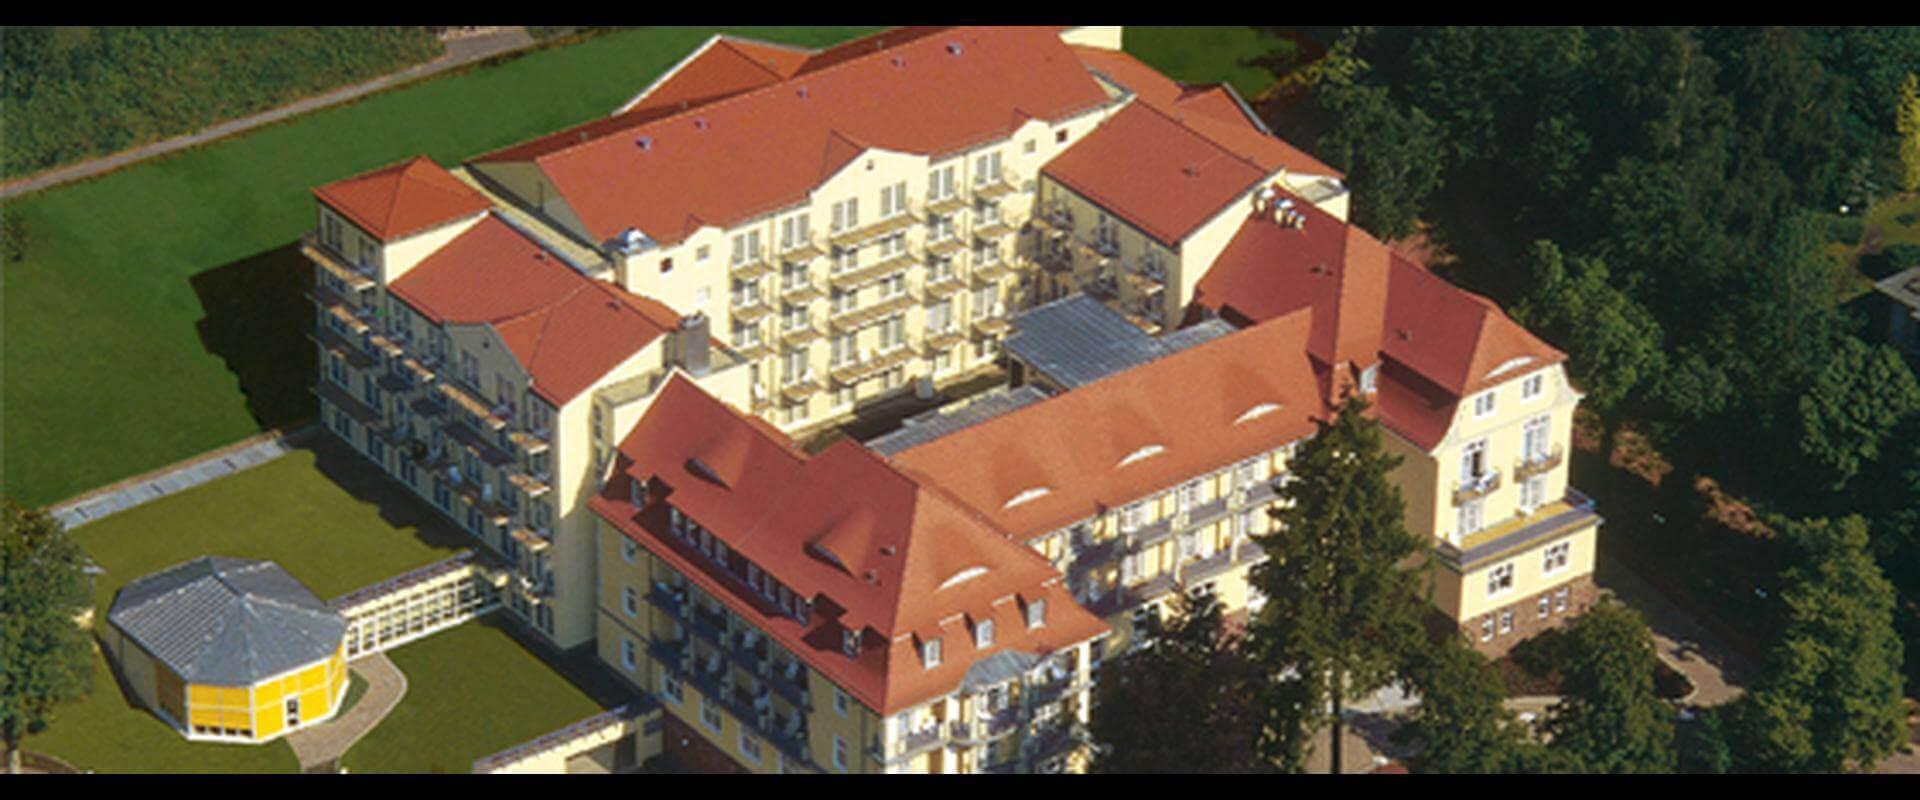 Luftbild der MEDIAN Frankenpark Klinik Bad Kissingen